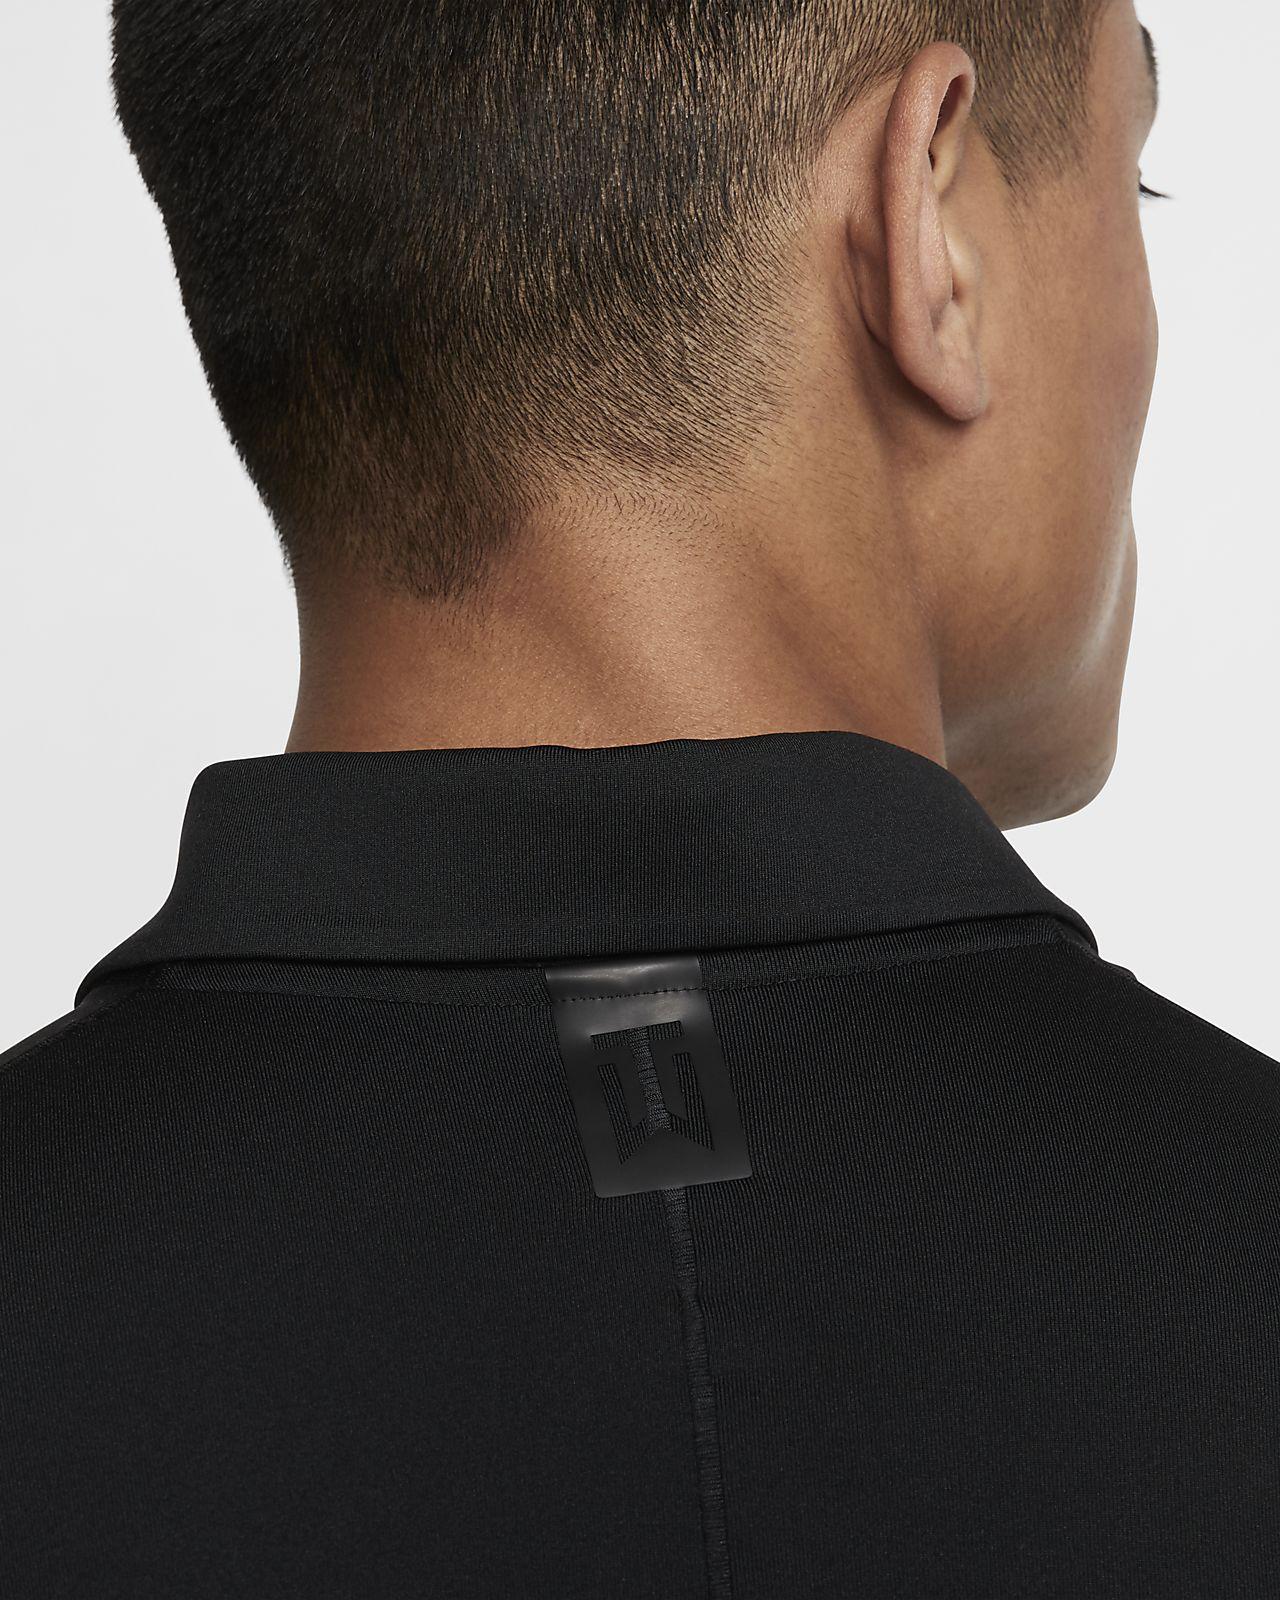 67c57de5a4d2b Nike Dri-FIT Tiger Woods Vapor Men s Striped Golf Polo. Nike.com CA